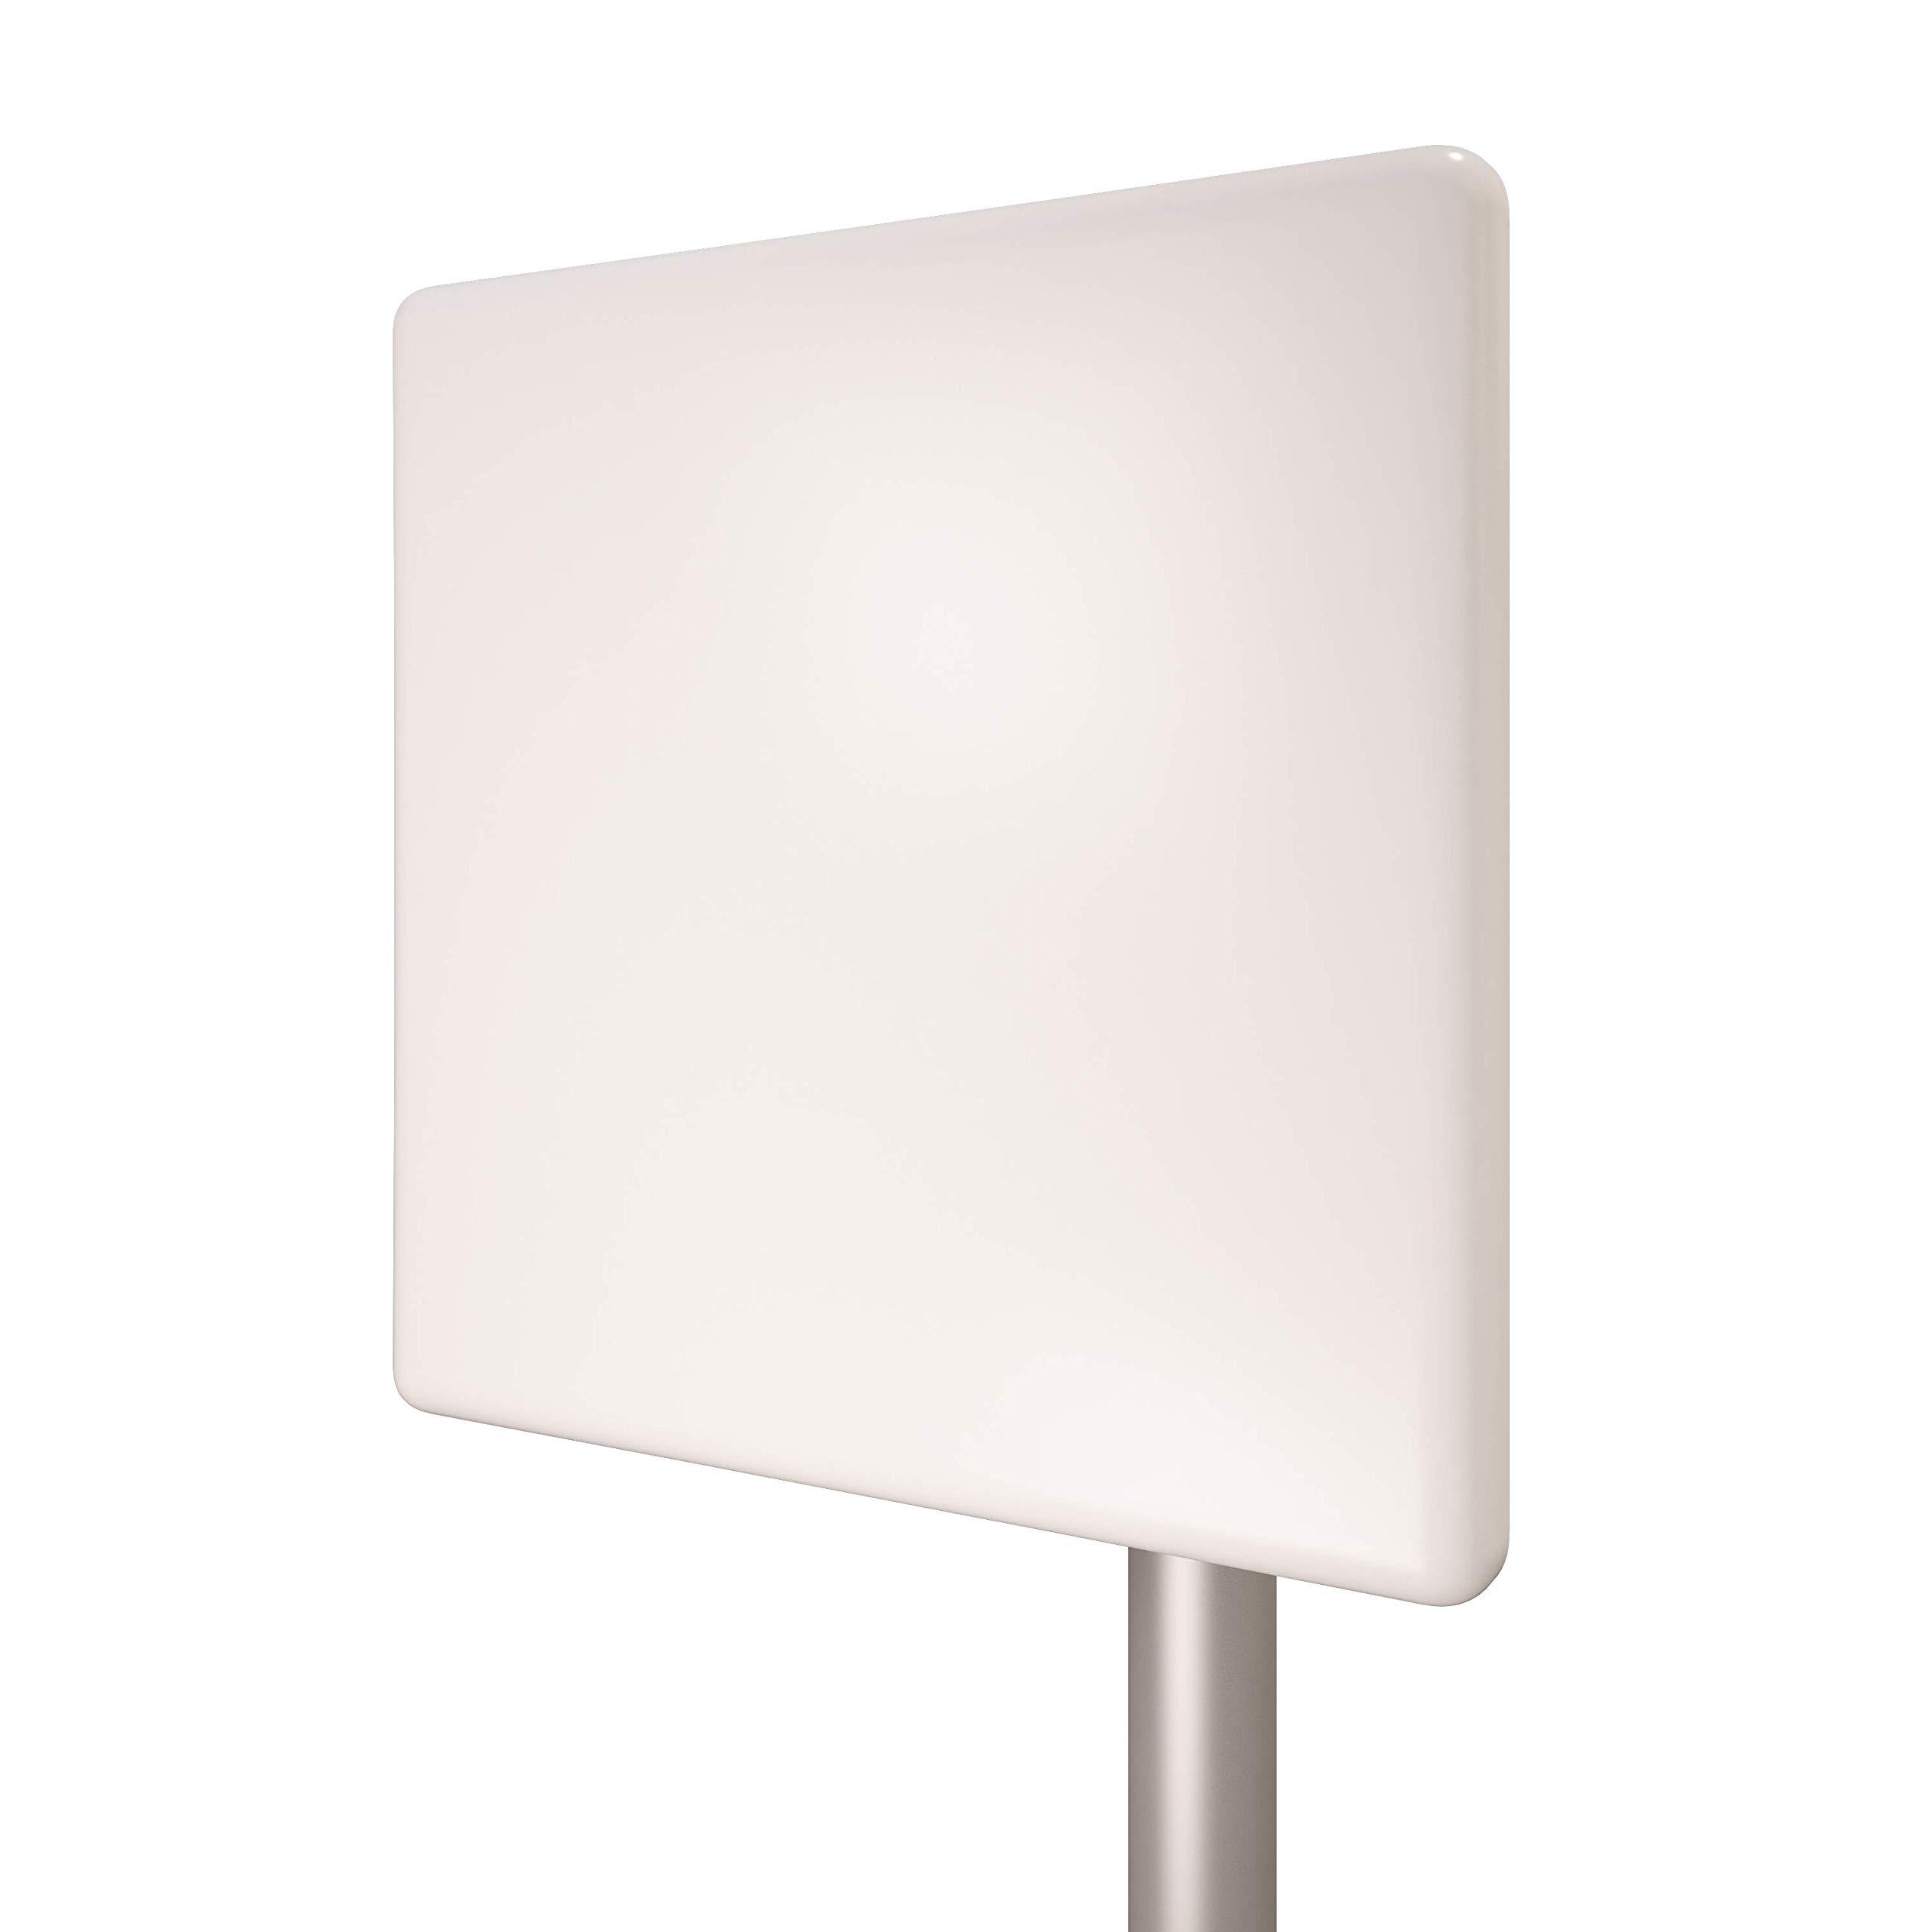 Tupavco TP511 Panel Antenna 2.4GHz WiFi 20dBi Wireless Outdoor 18° Directional N (f) High Gain Range by Tupavco